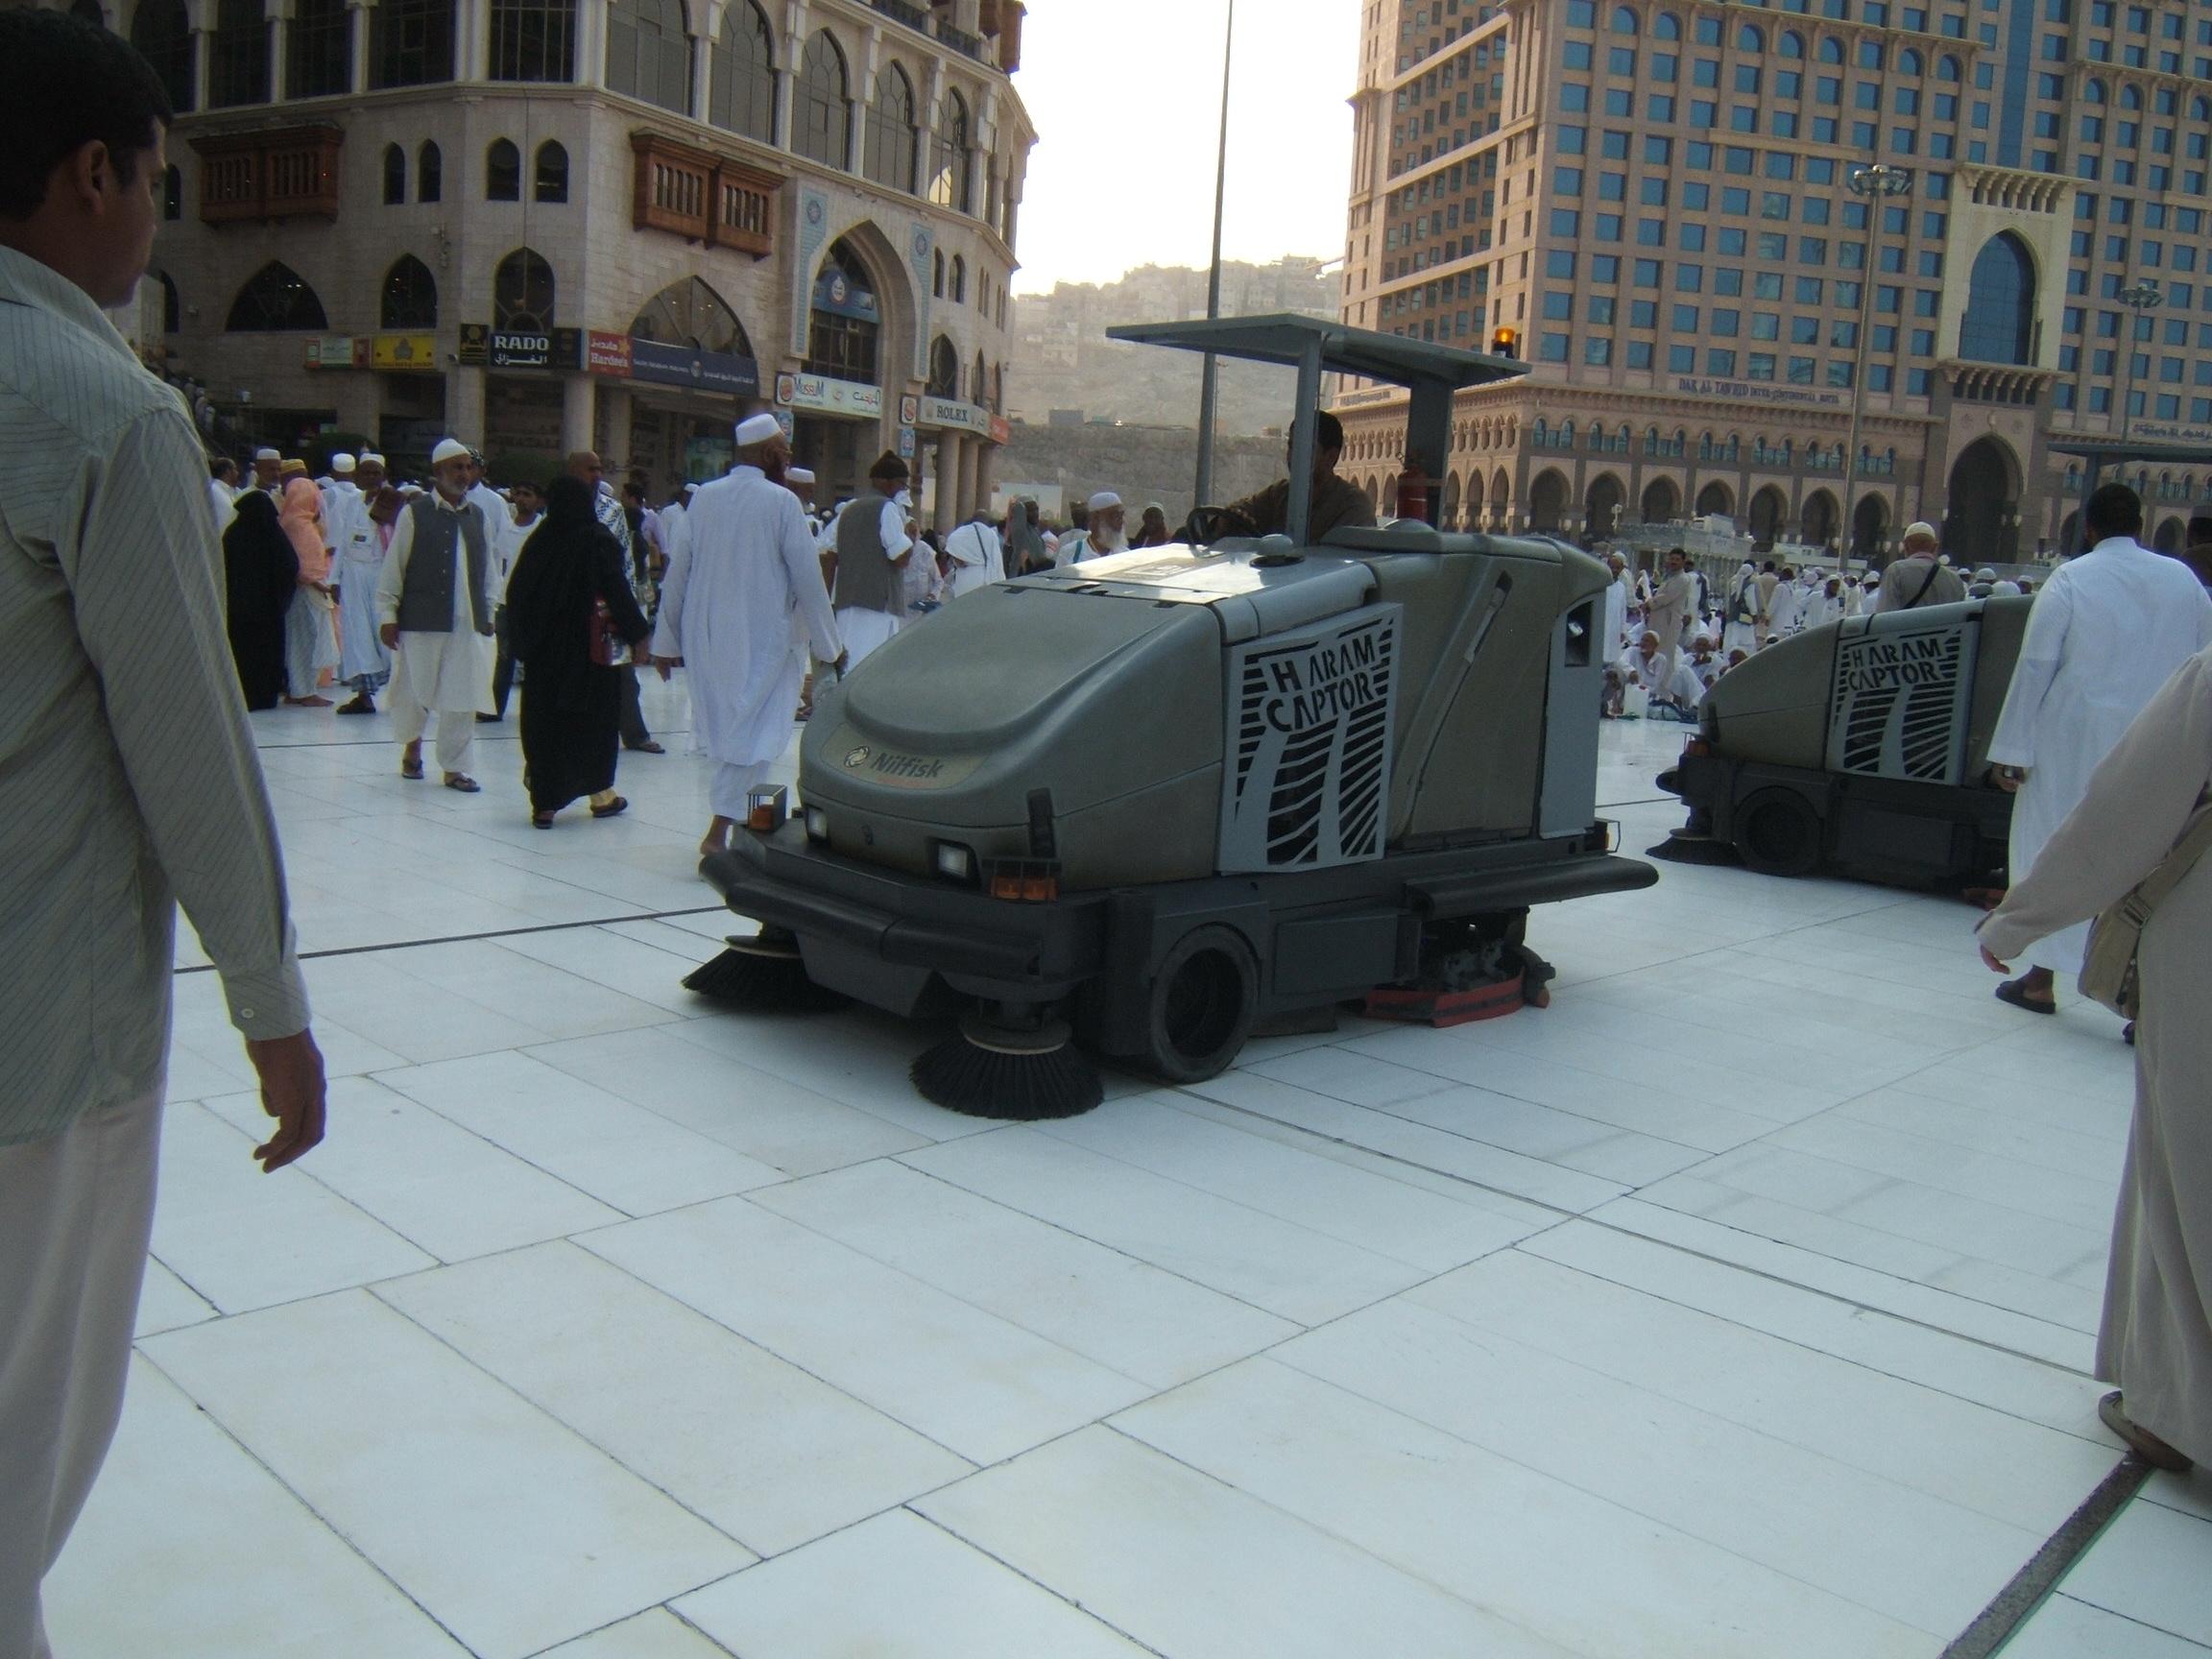 Mesin alat pembersih lantai ini puluhan jumlah nya dioperasikan baik di Masjdidil Haram maupun di Masjid Nabawi di Madinah.